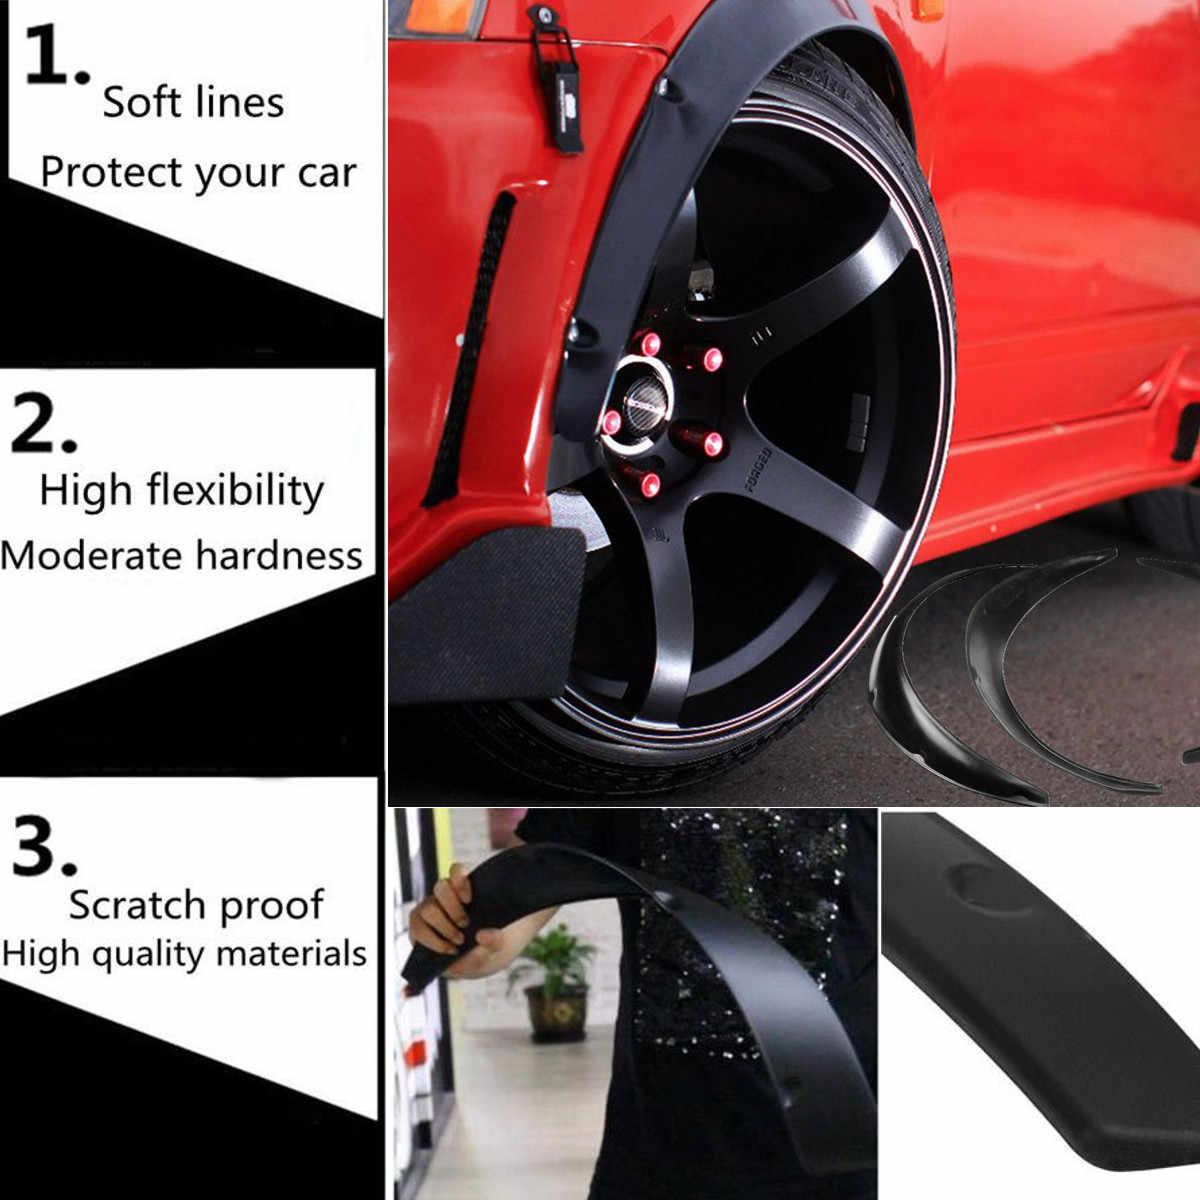 Embellecedor de arco de rueda par de molduras de arco de cejas de rueda de coche universales Protector de bengalas de guardabarros Material ABS